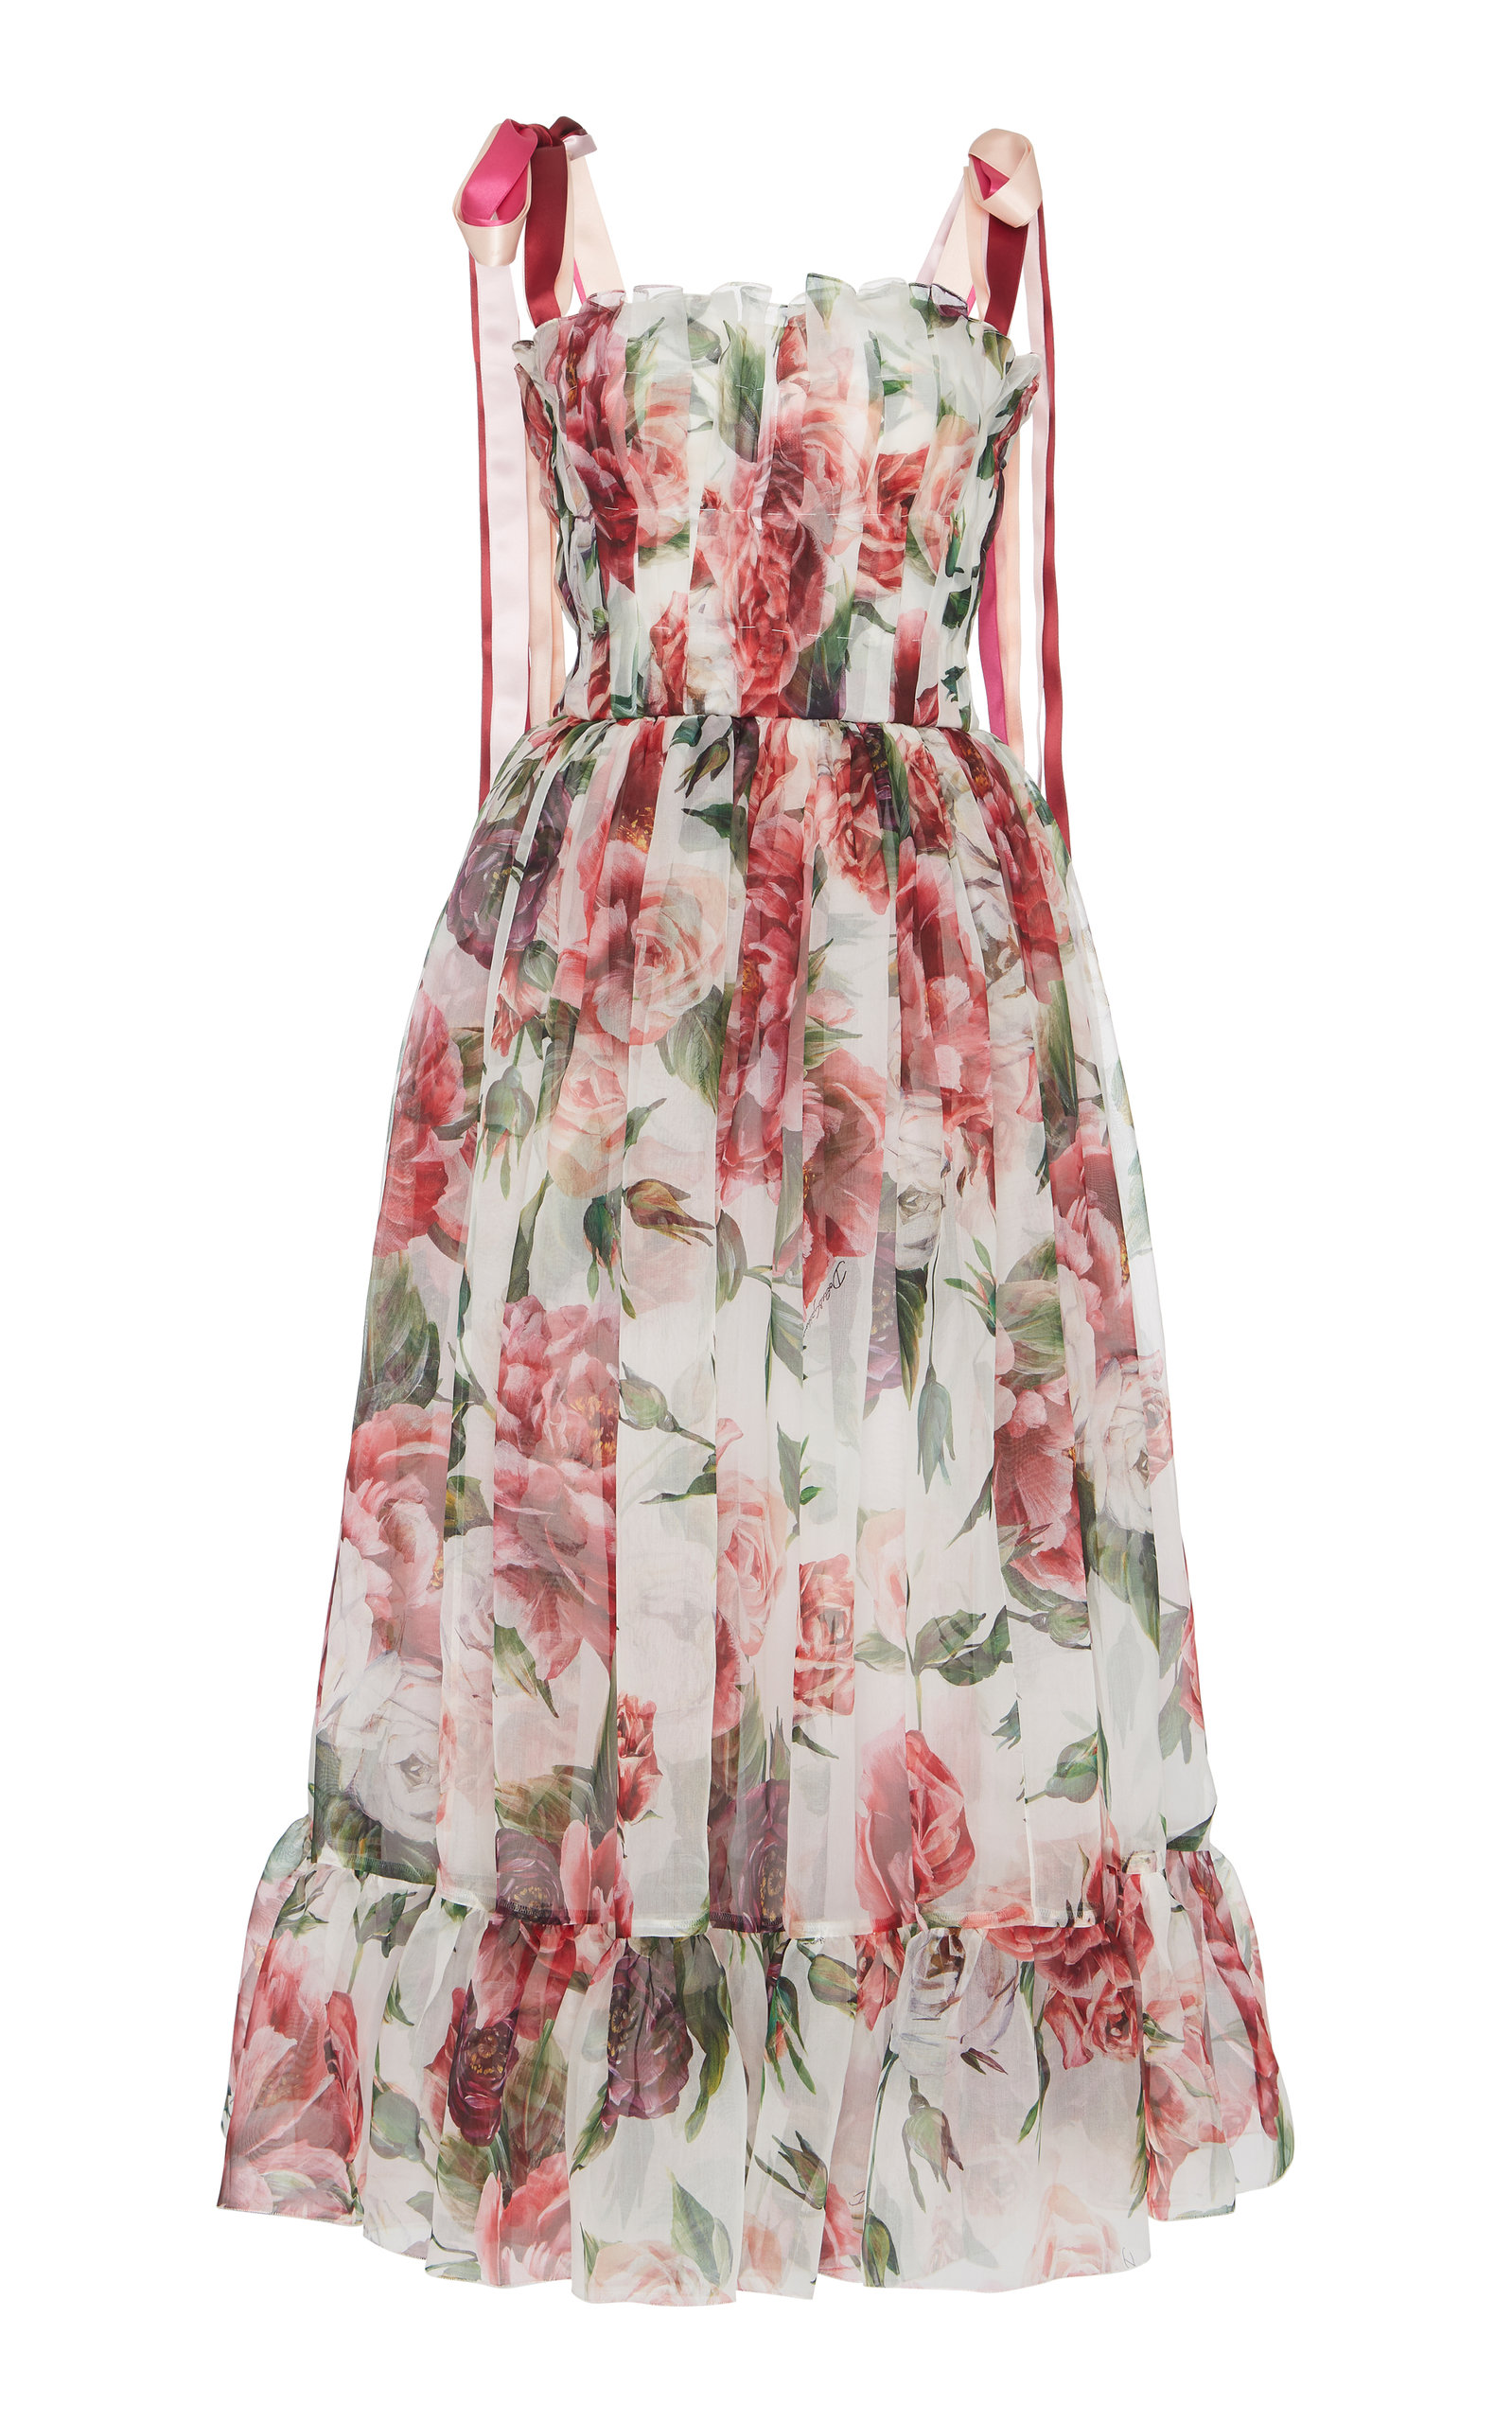 Peony print midi dress Dolce & Gabbana pVNi0c5e